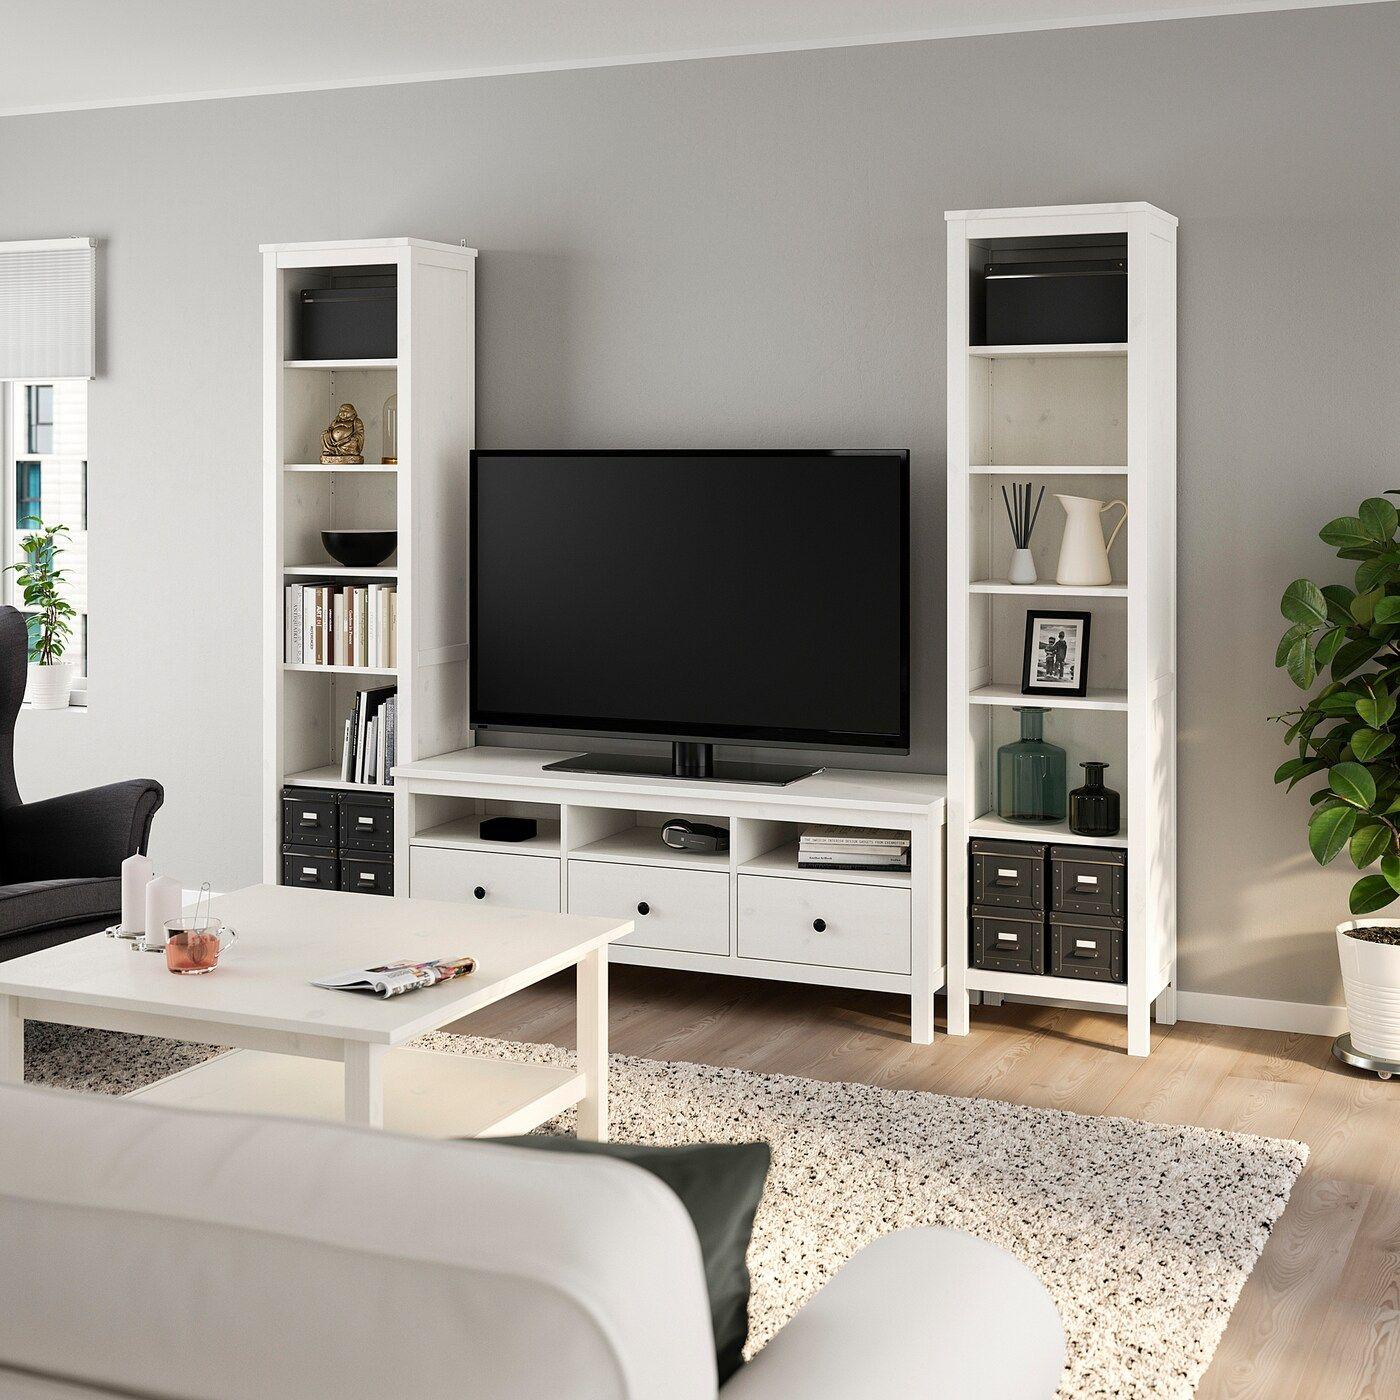 Hemnes Tv Storage Combination White Stain 96 1 2x77 1 2 Ikea Meuble Tv Rangement Mobilier De Salon Hemnes